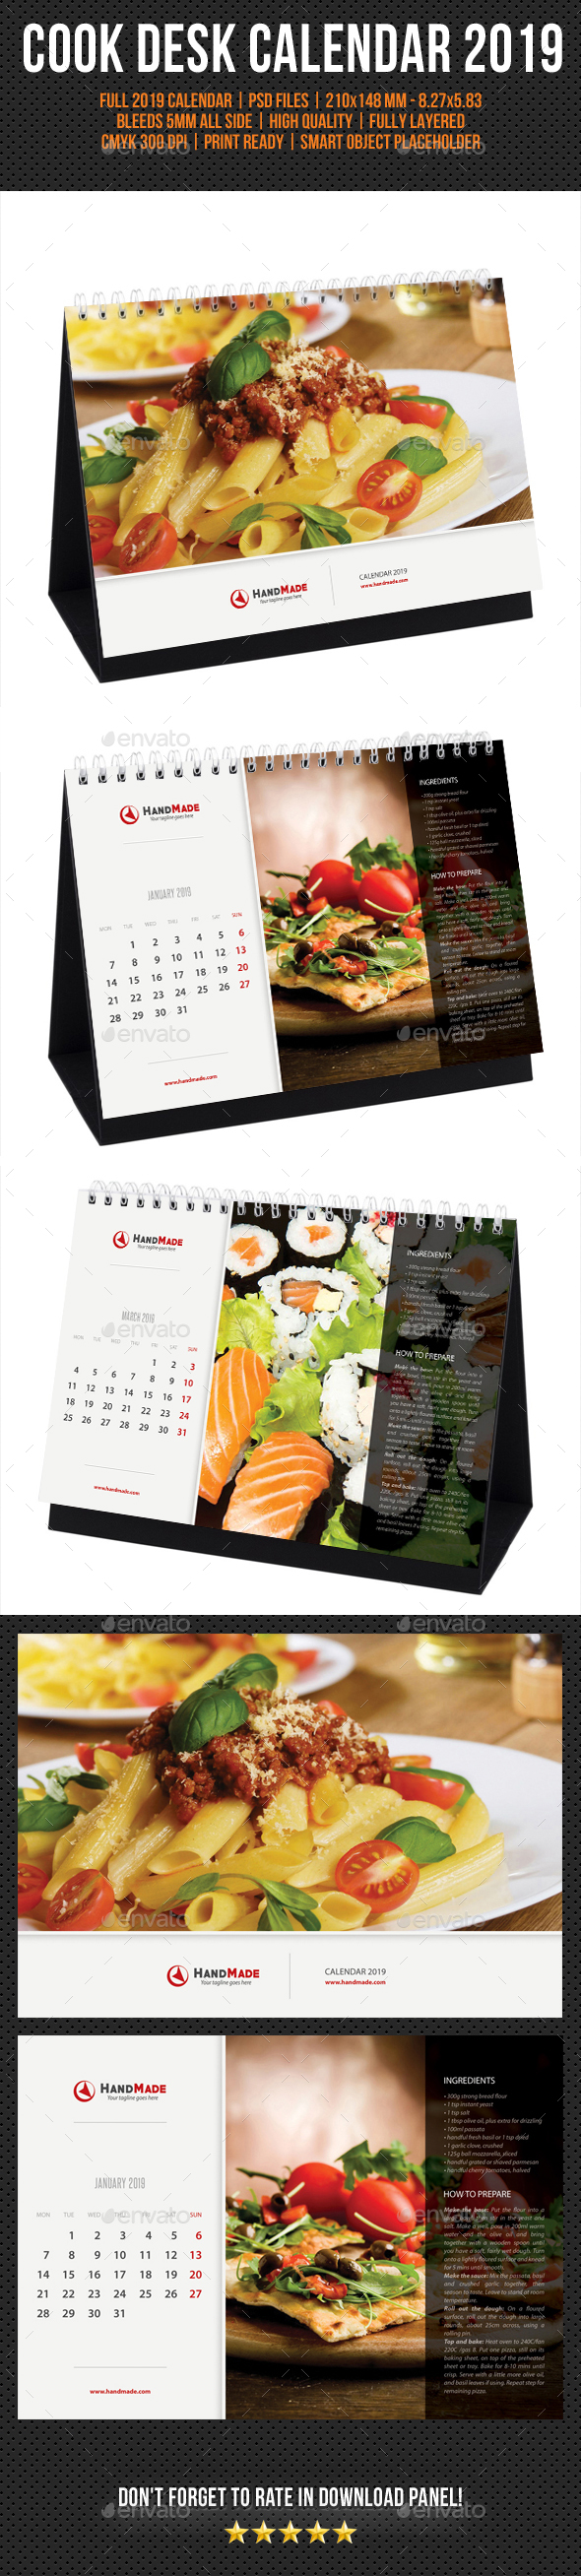 Cook And Food Desk Calendar 2019 - Calendars Stationery